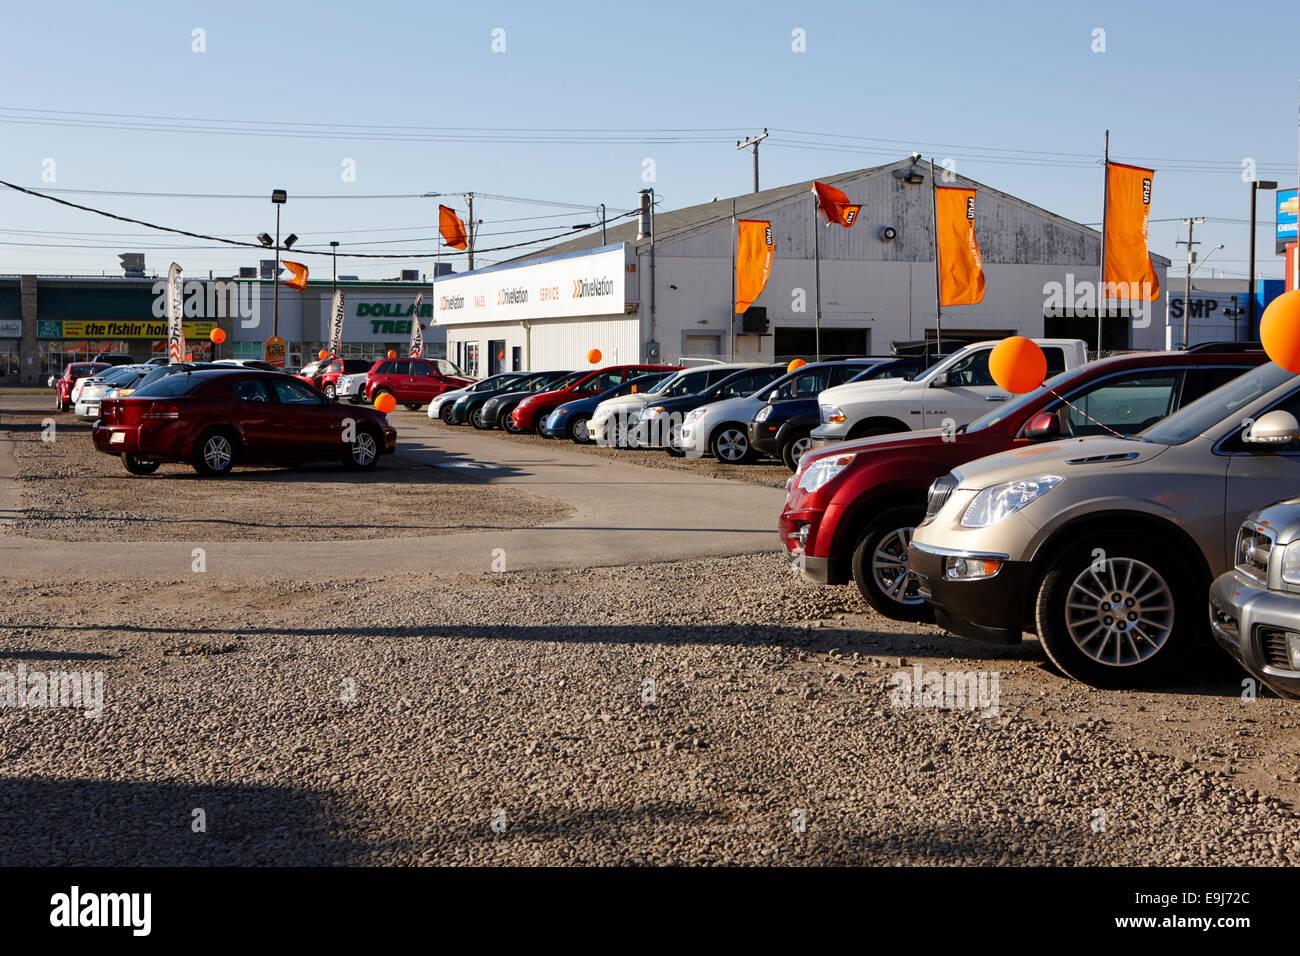 used car lot Saskatchewan Canada Stock Photo, Royalty Free Image ...